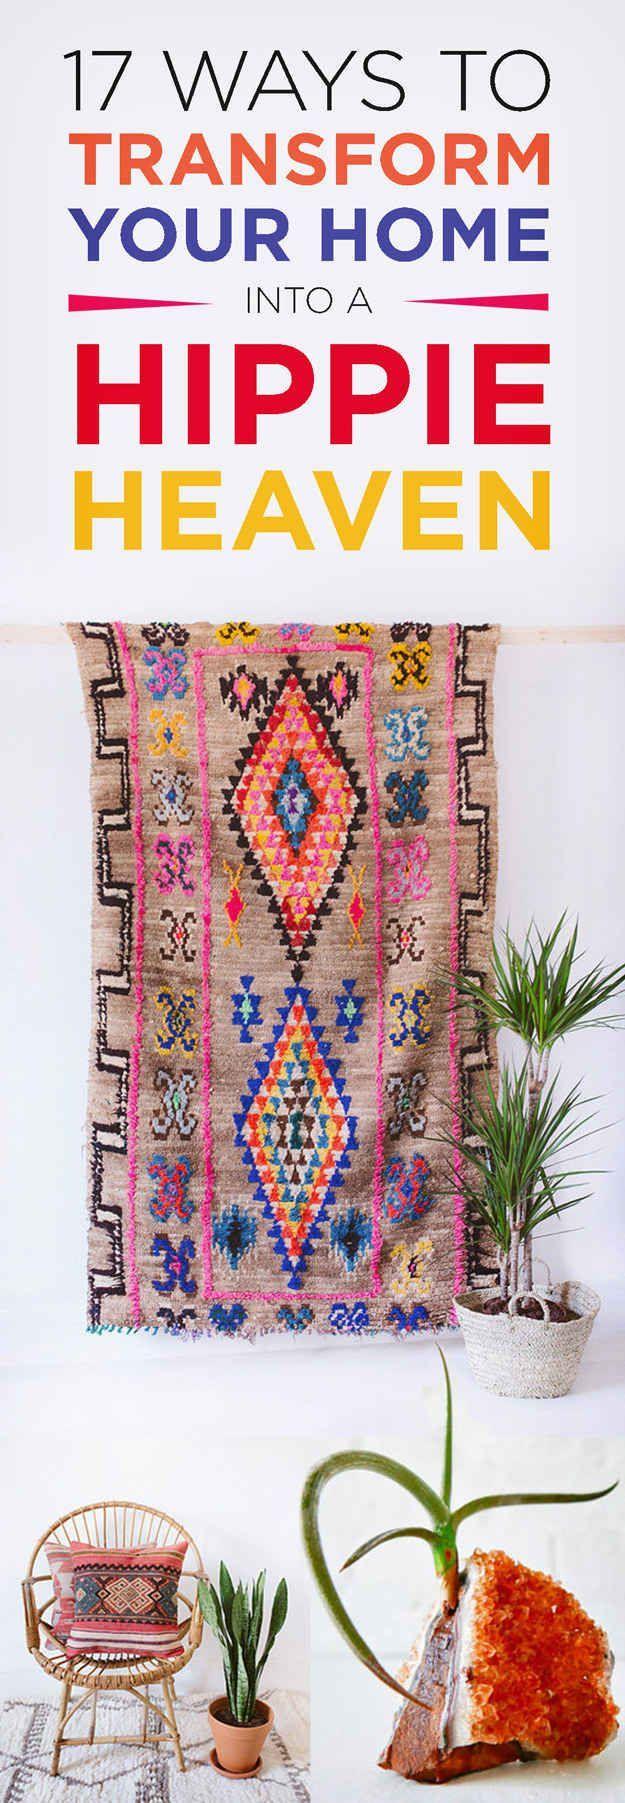 17 best ideas about hippie home decor on pinterest for Decoration hippie